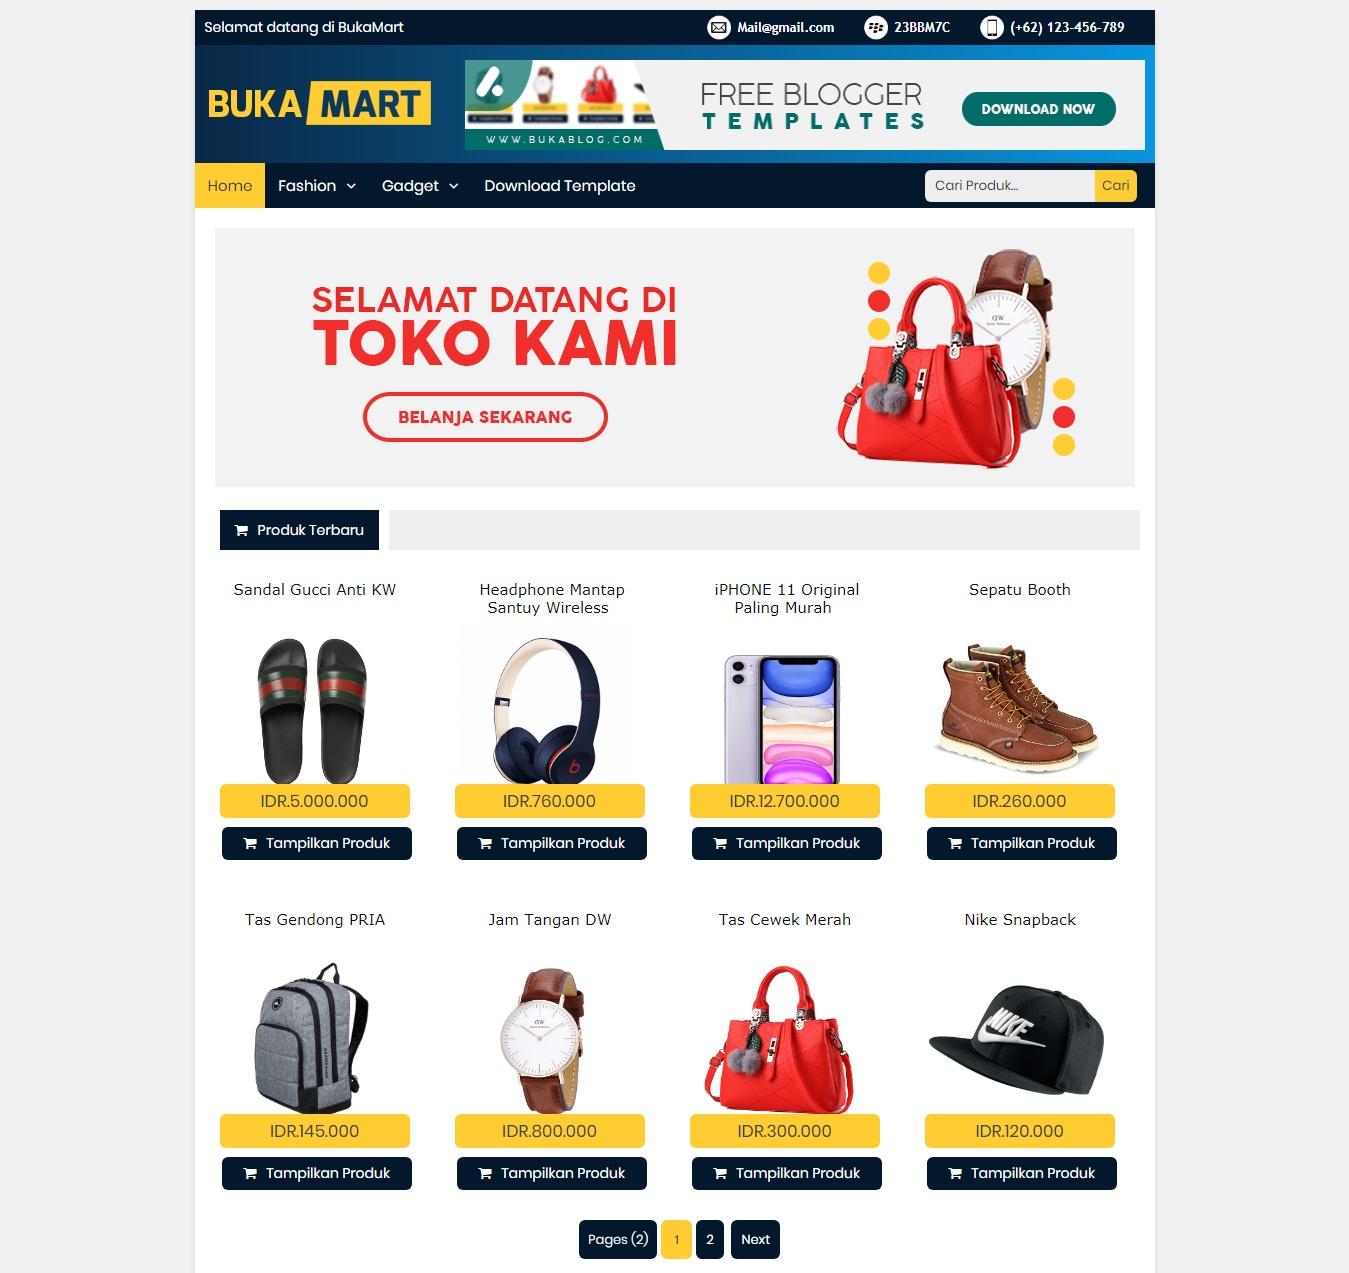 Template-toko-online-gratis-bukamart-blogspot